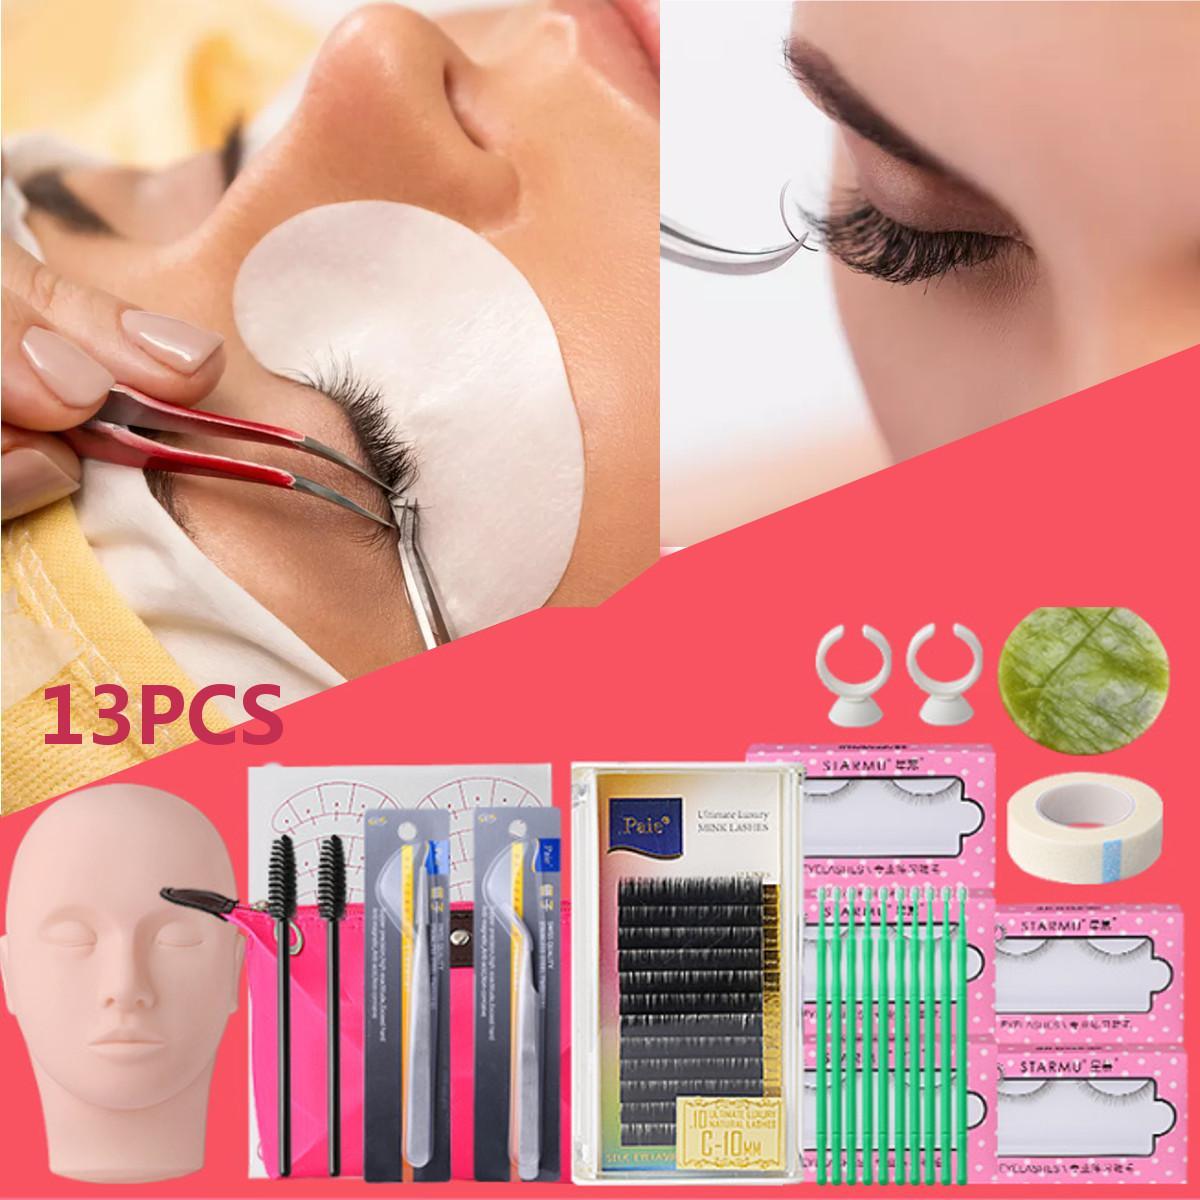 13 In 1 Mannequin Head Lash Eyelash